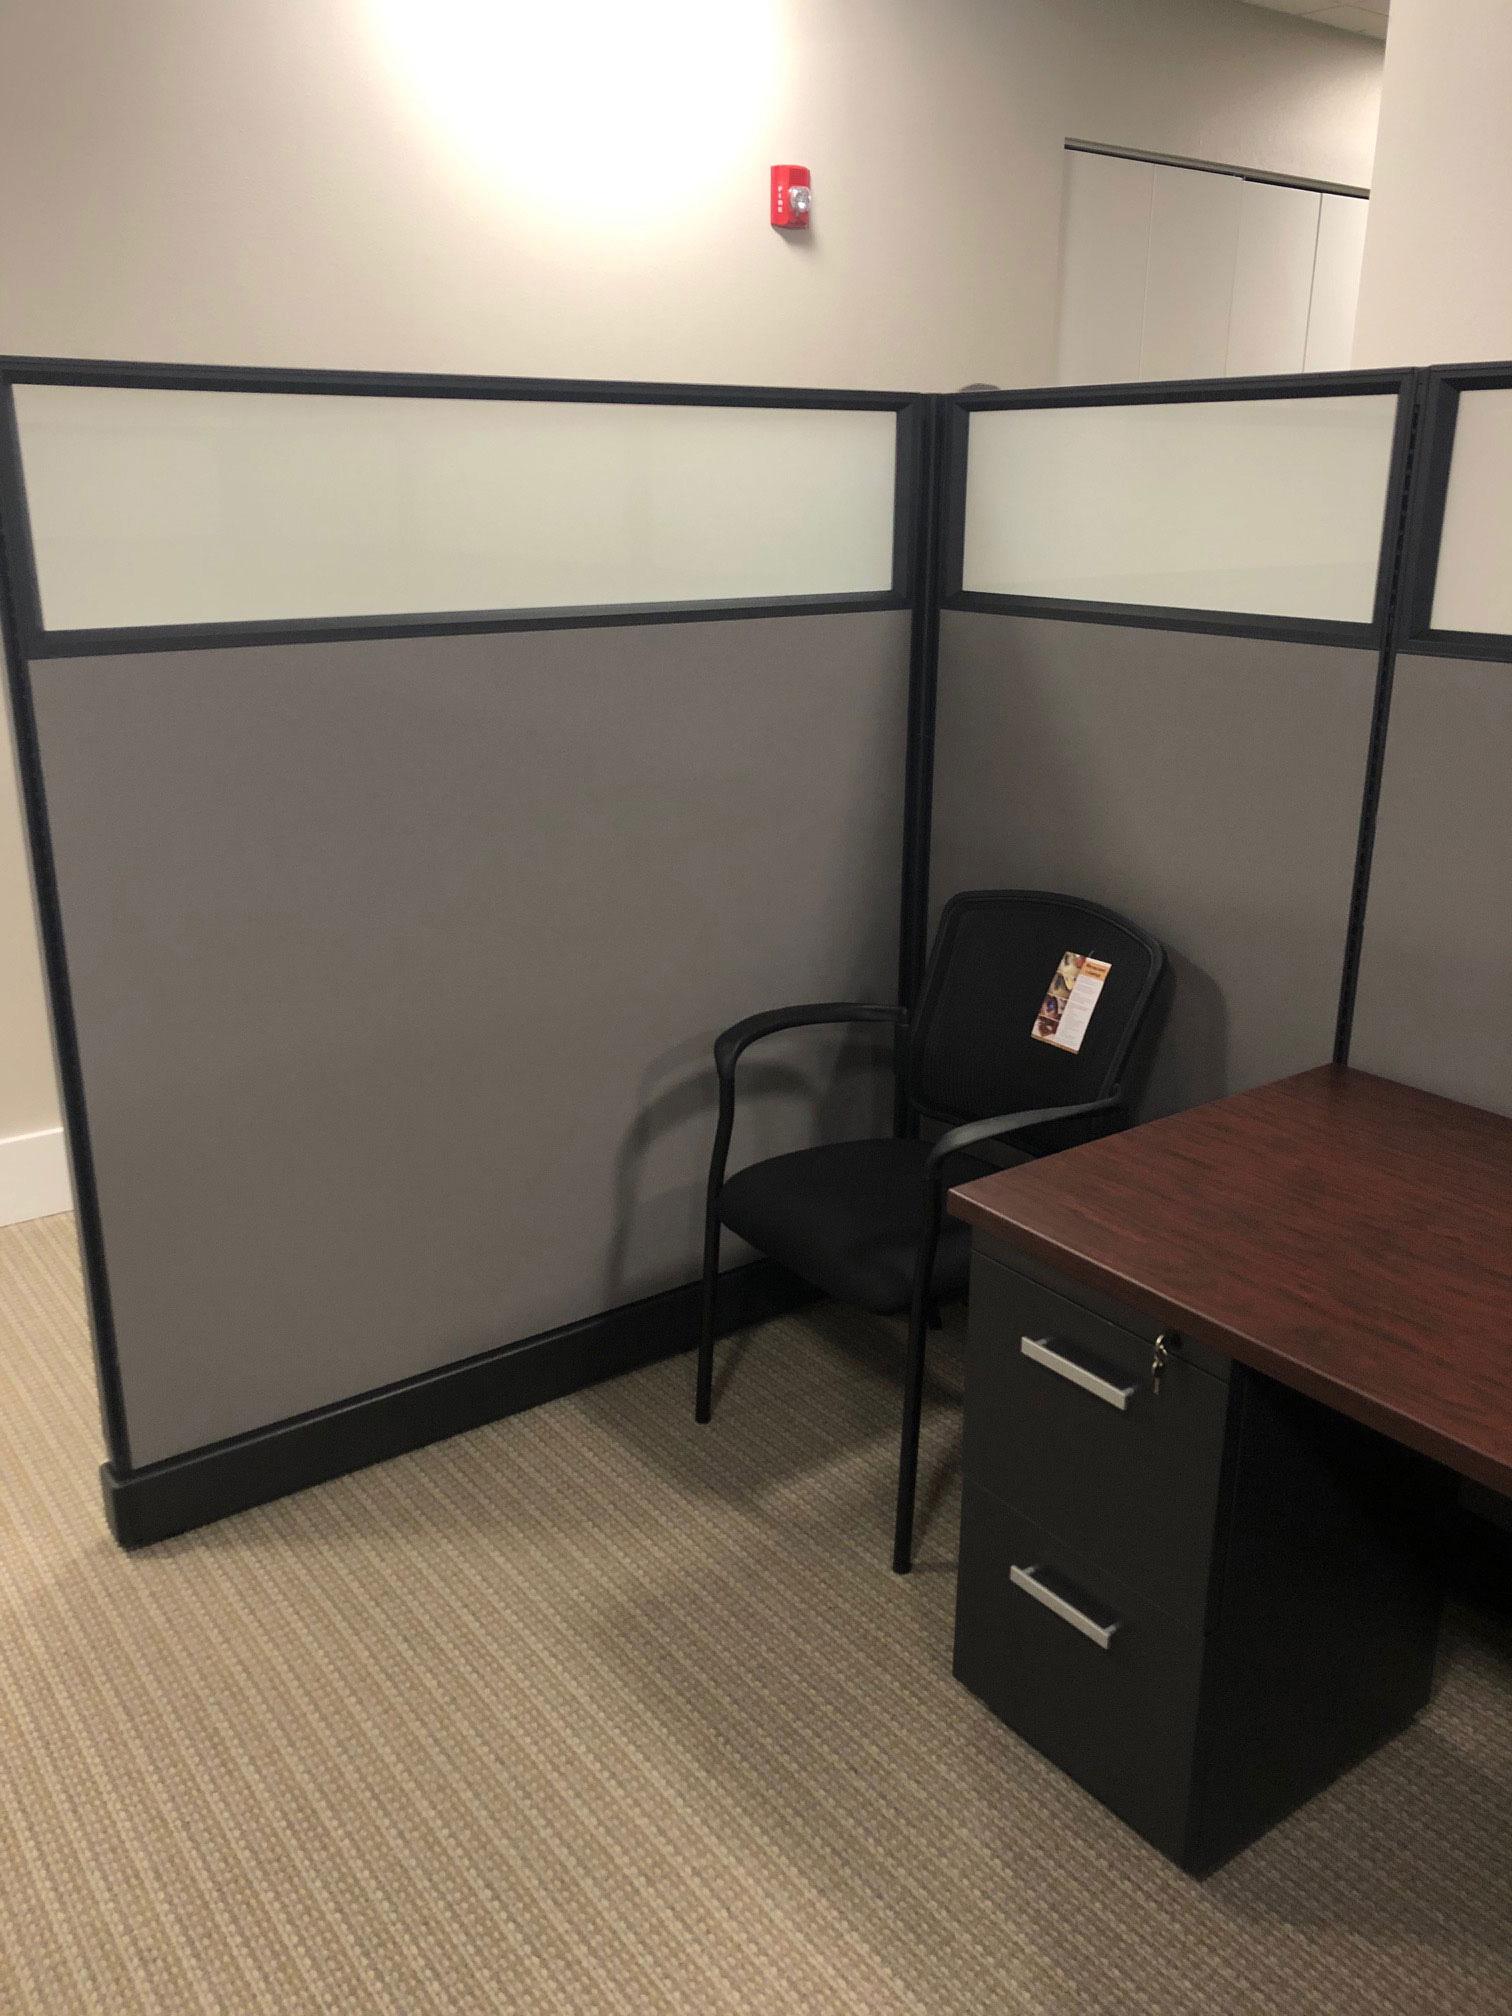 office-cubicles-for-sale-in-altamonte-springs-florida-3.jpg